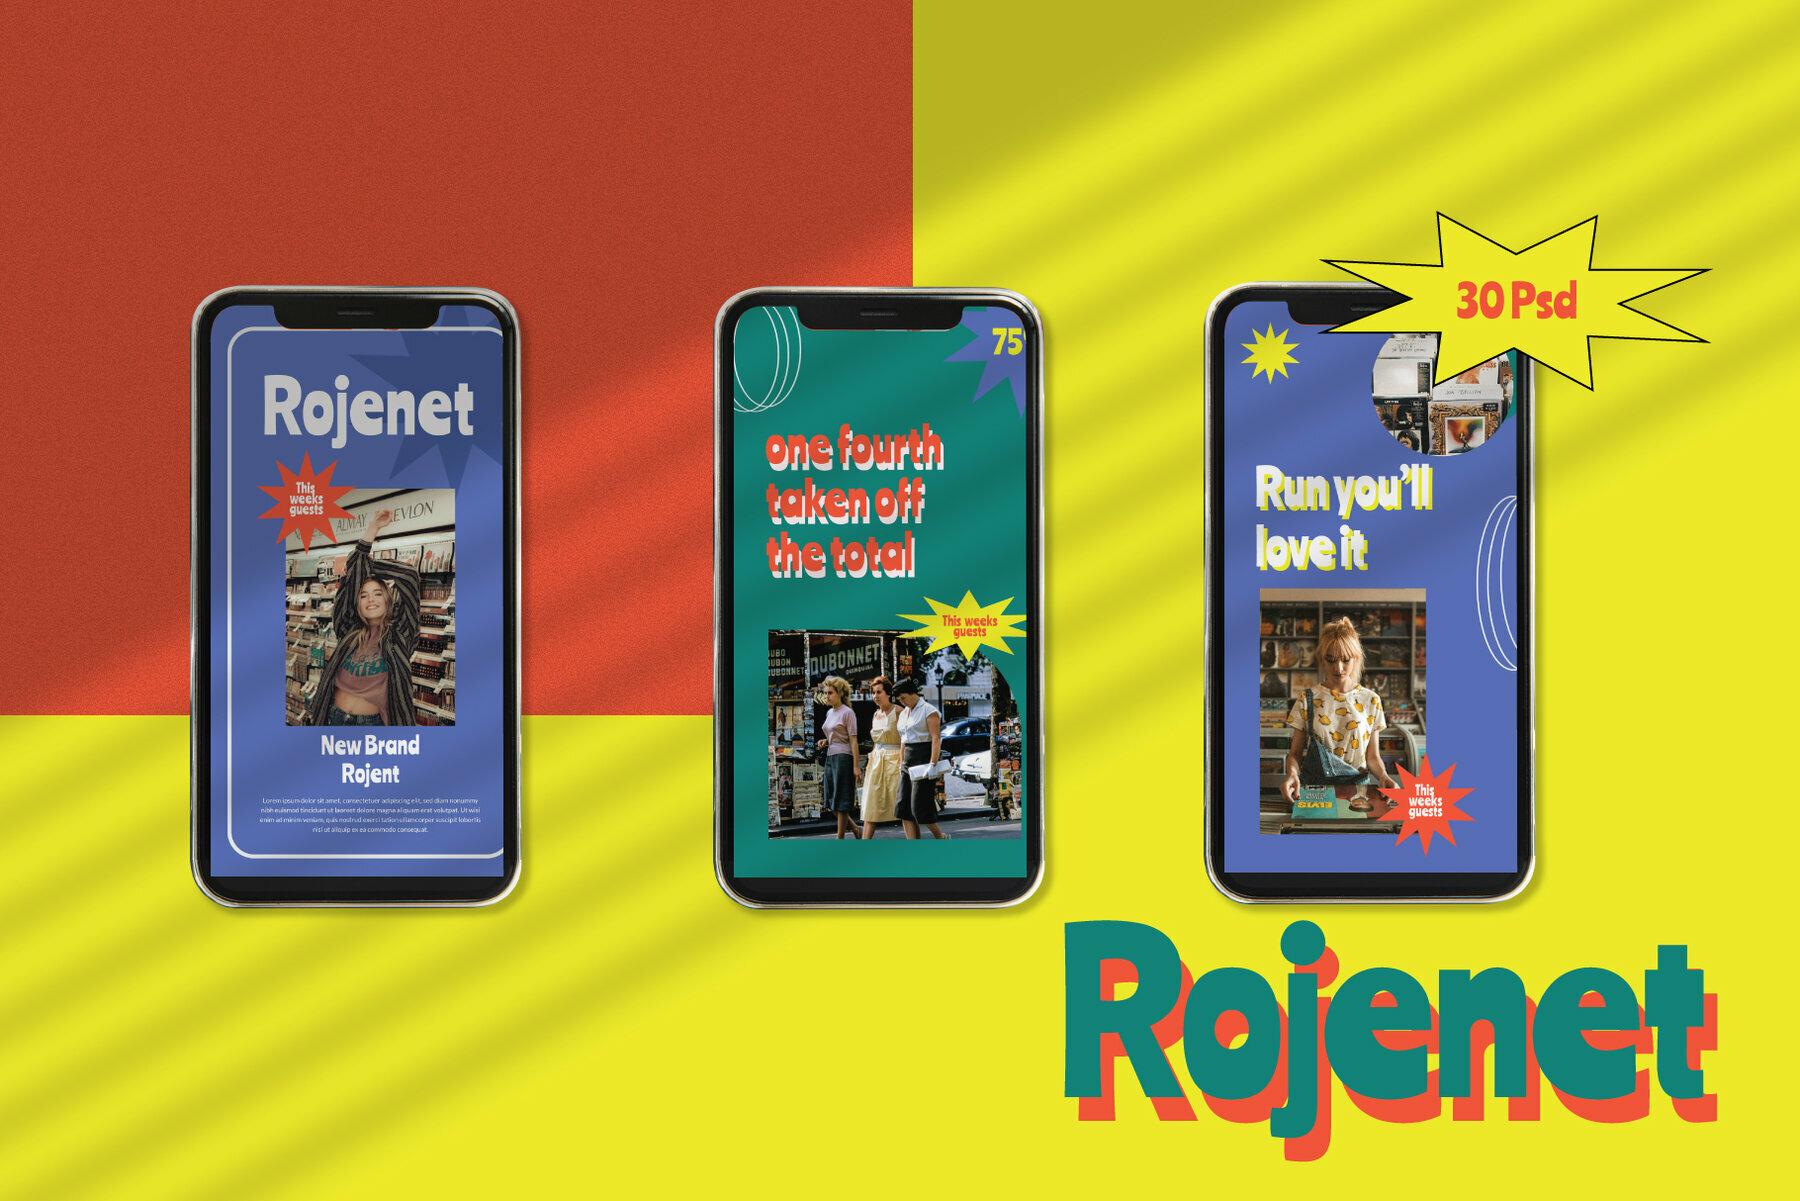 Rojanet Instagram Template